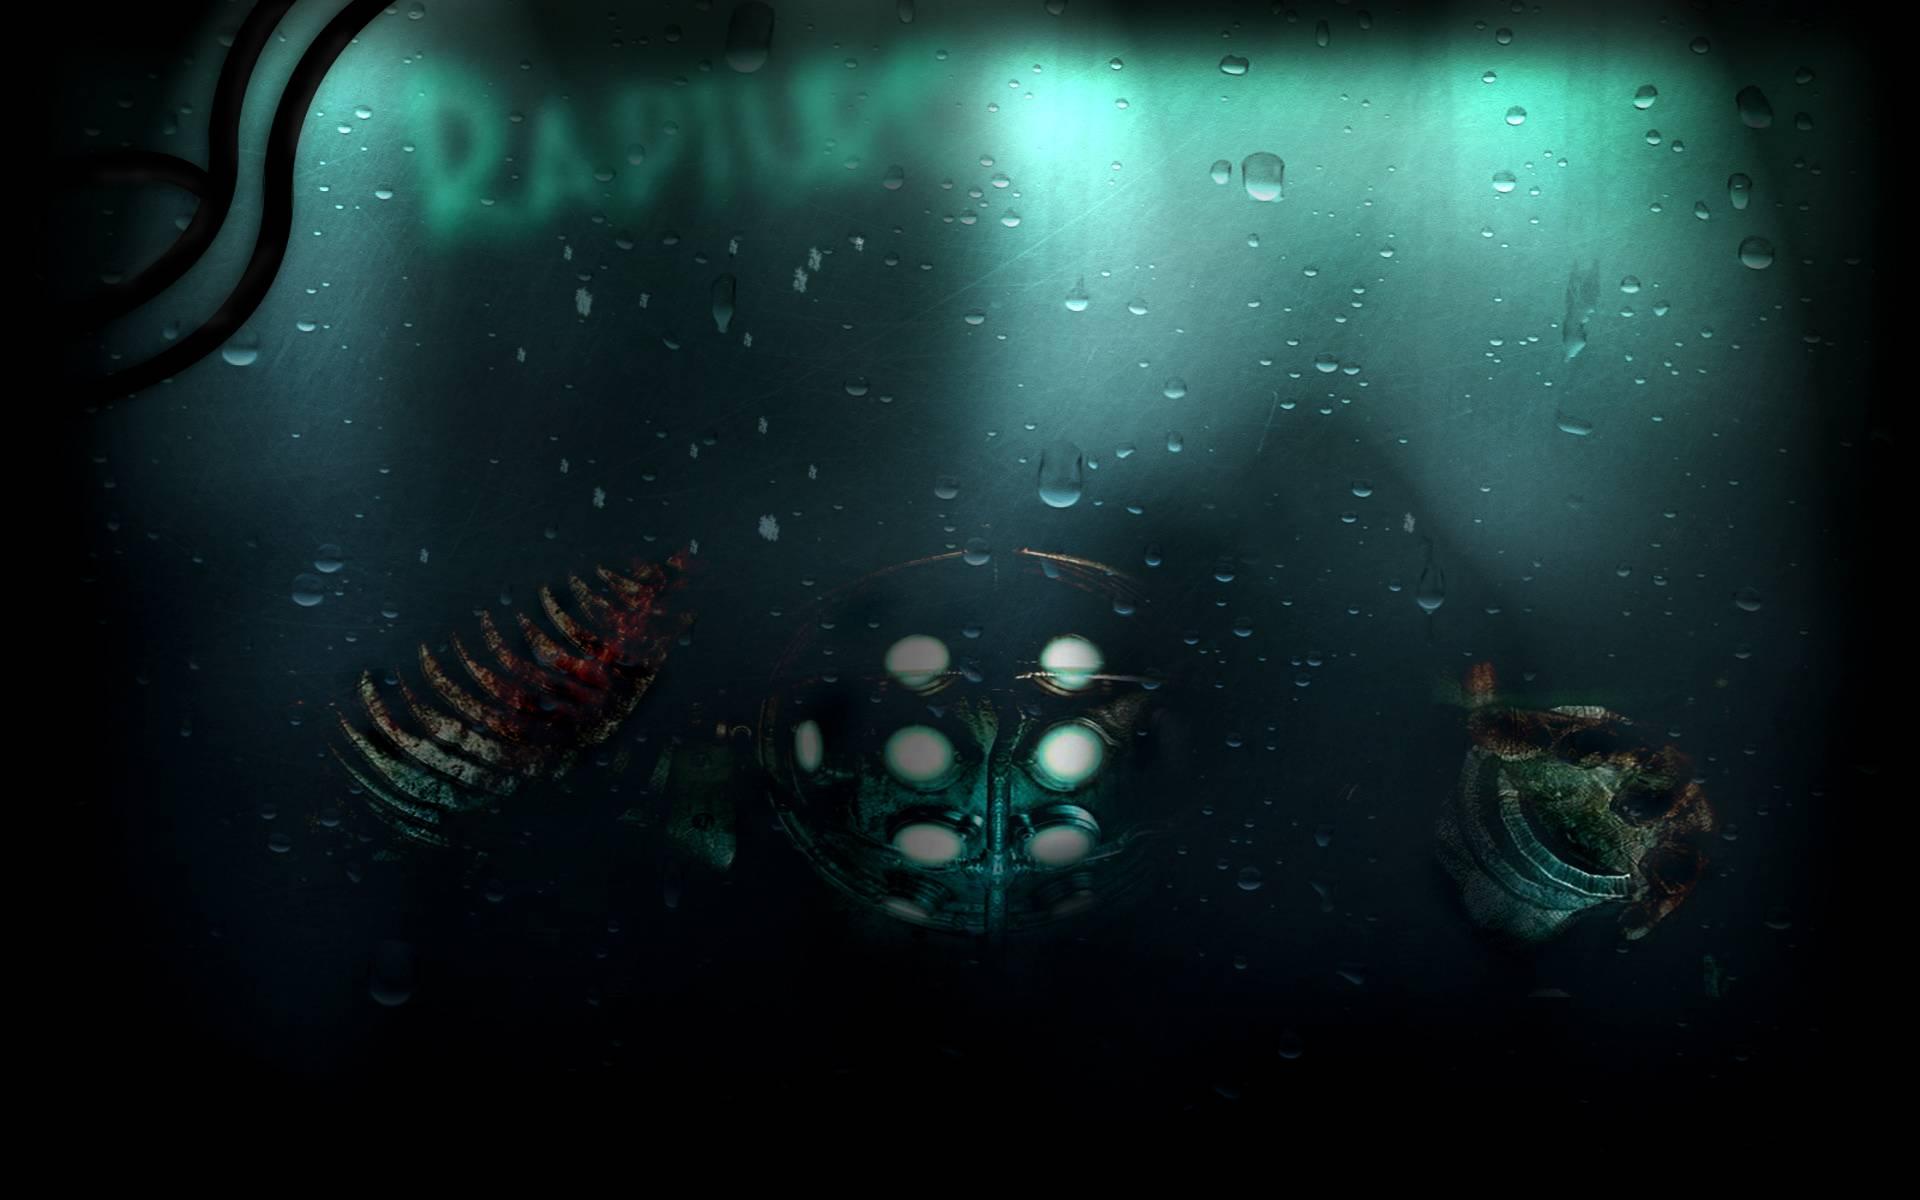 HQ BioShock Abyss Wallpaper   HQ Wallpapers 1920x1200